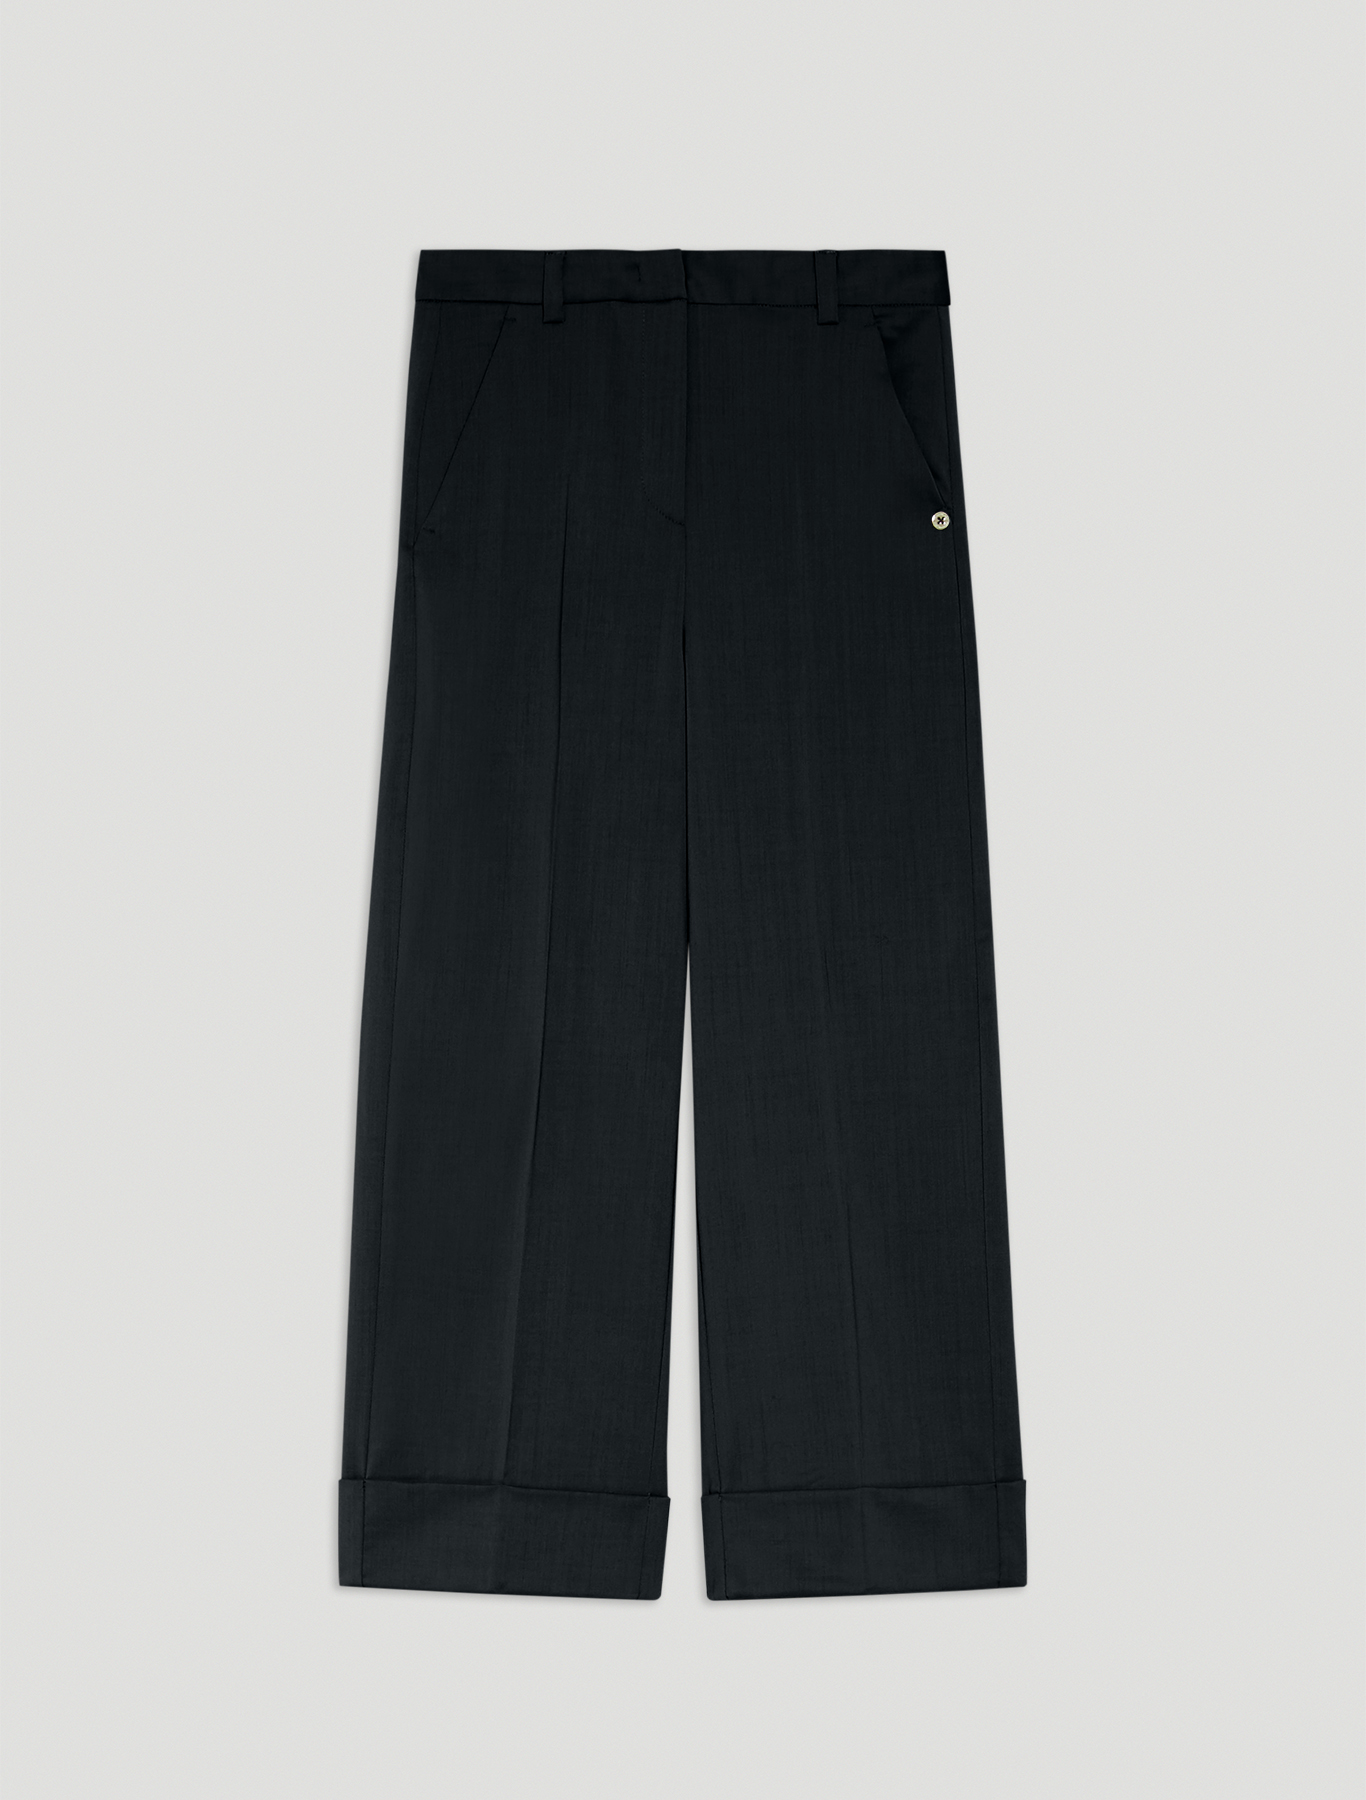 Wool twill trousers - black - pennyblack